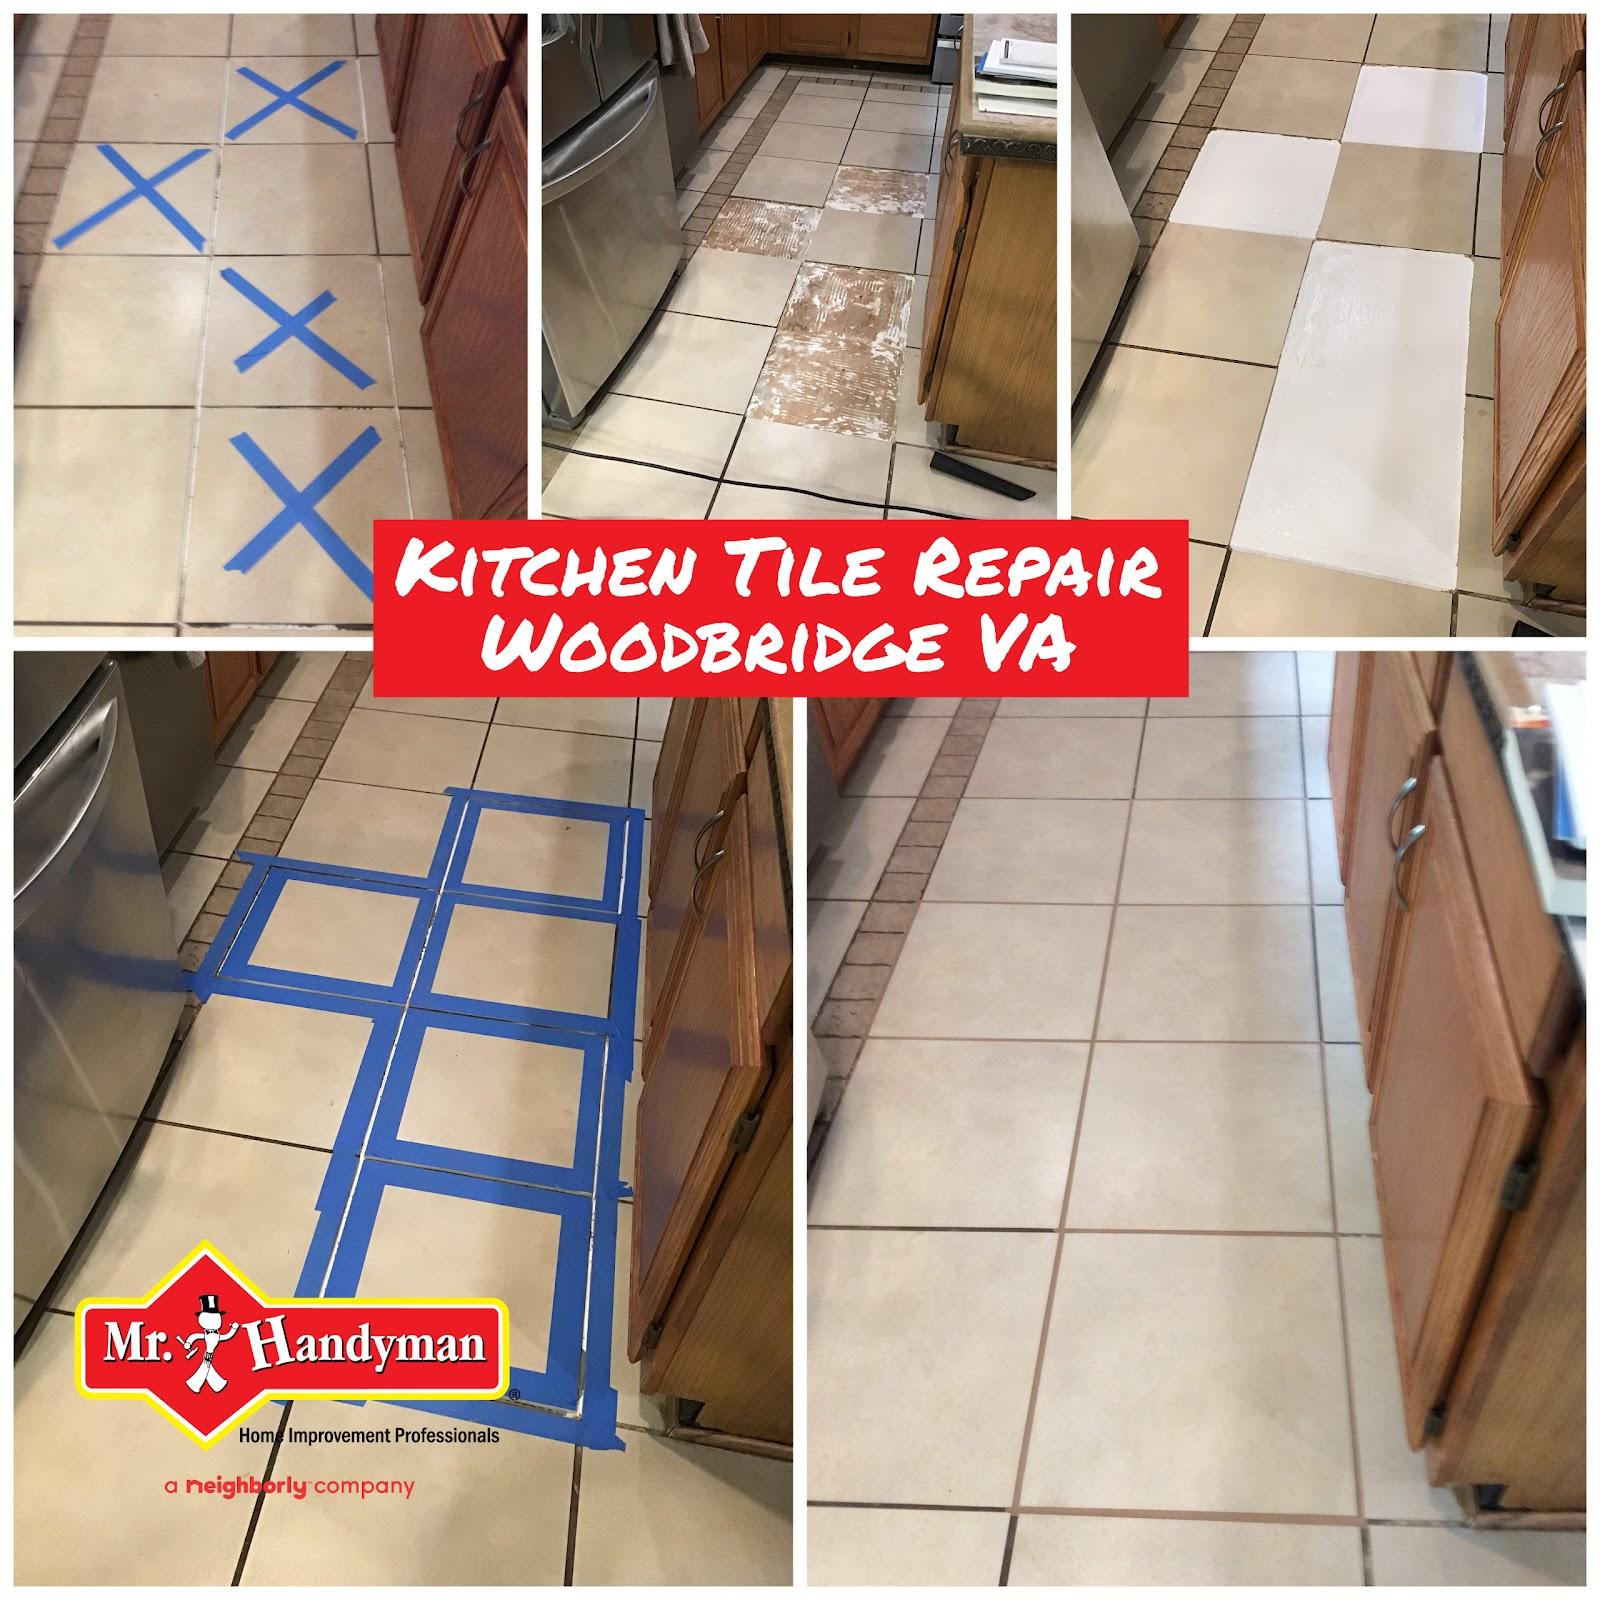 Woodbridge Tile Repair